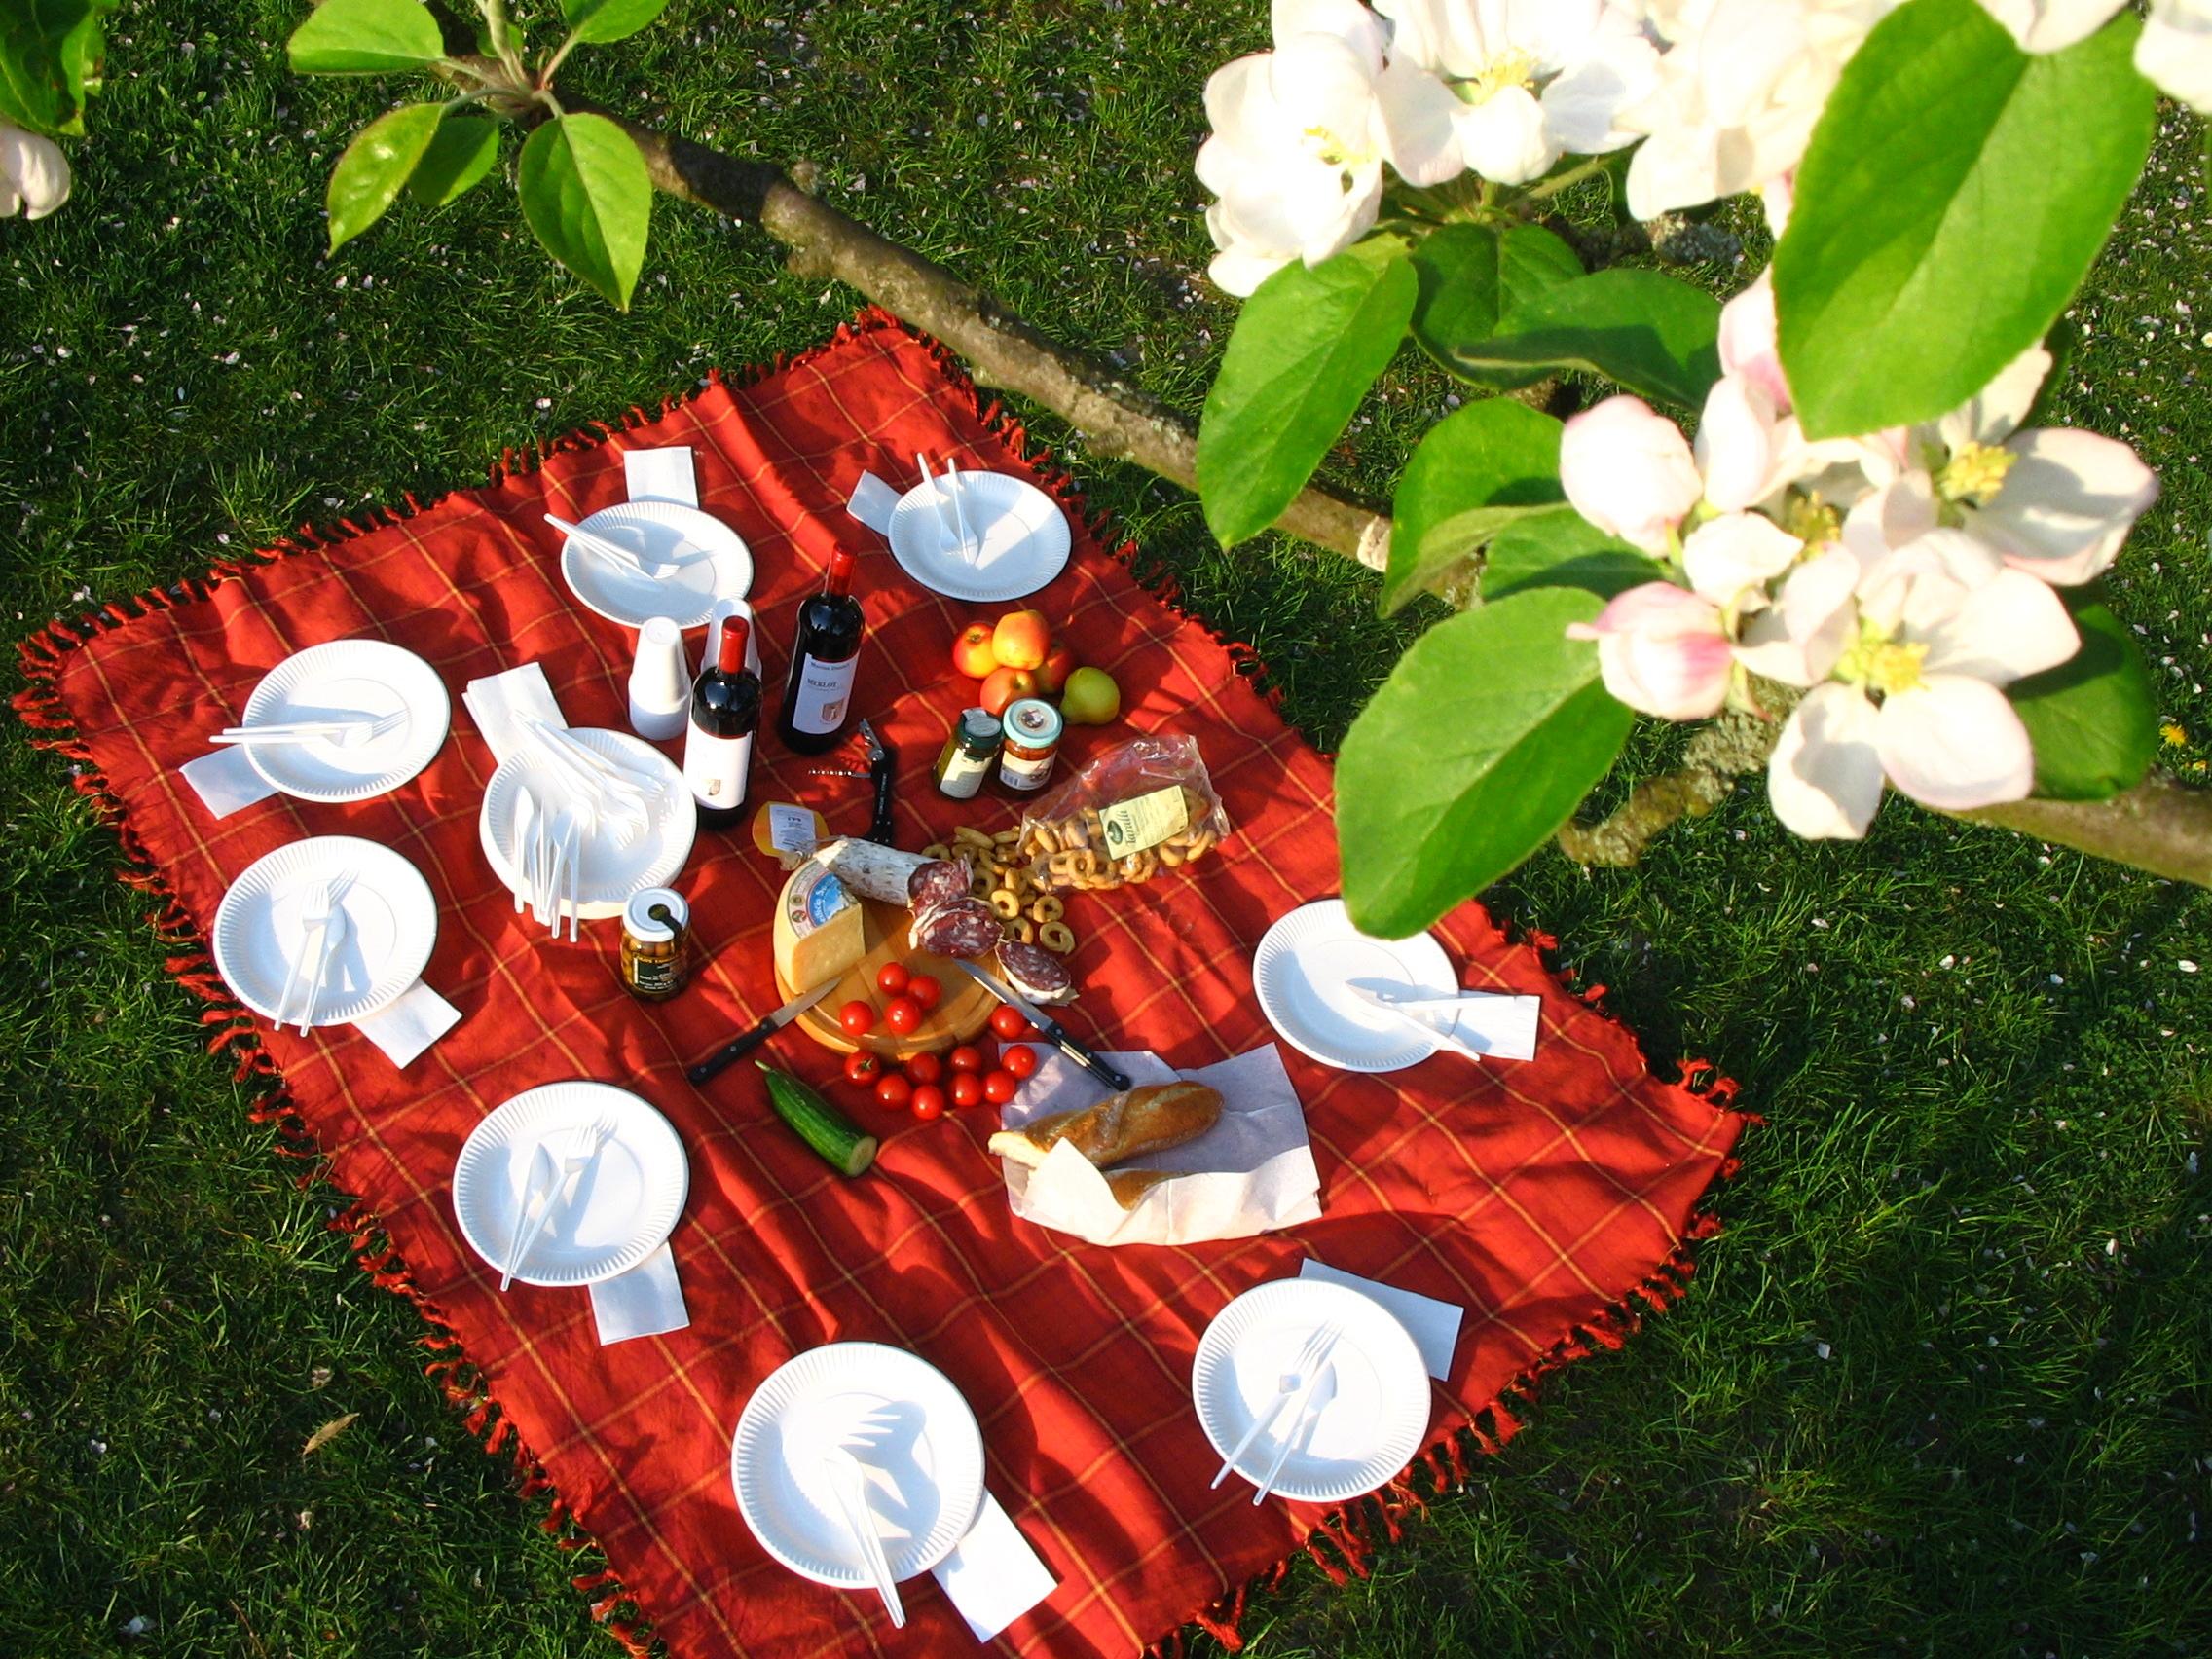 Picknick im Frühling